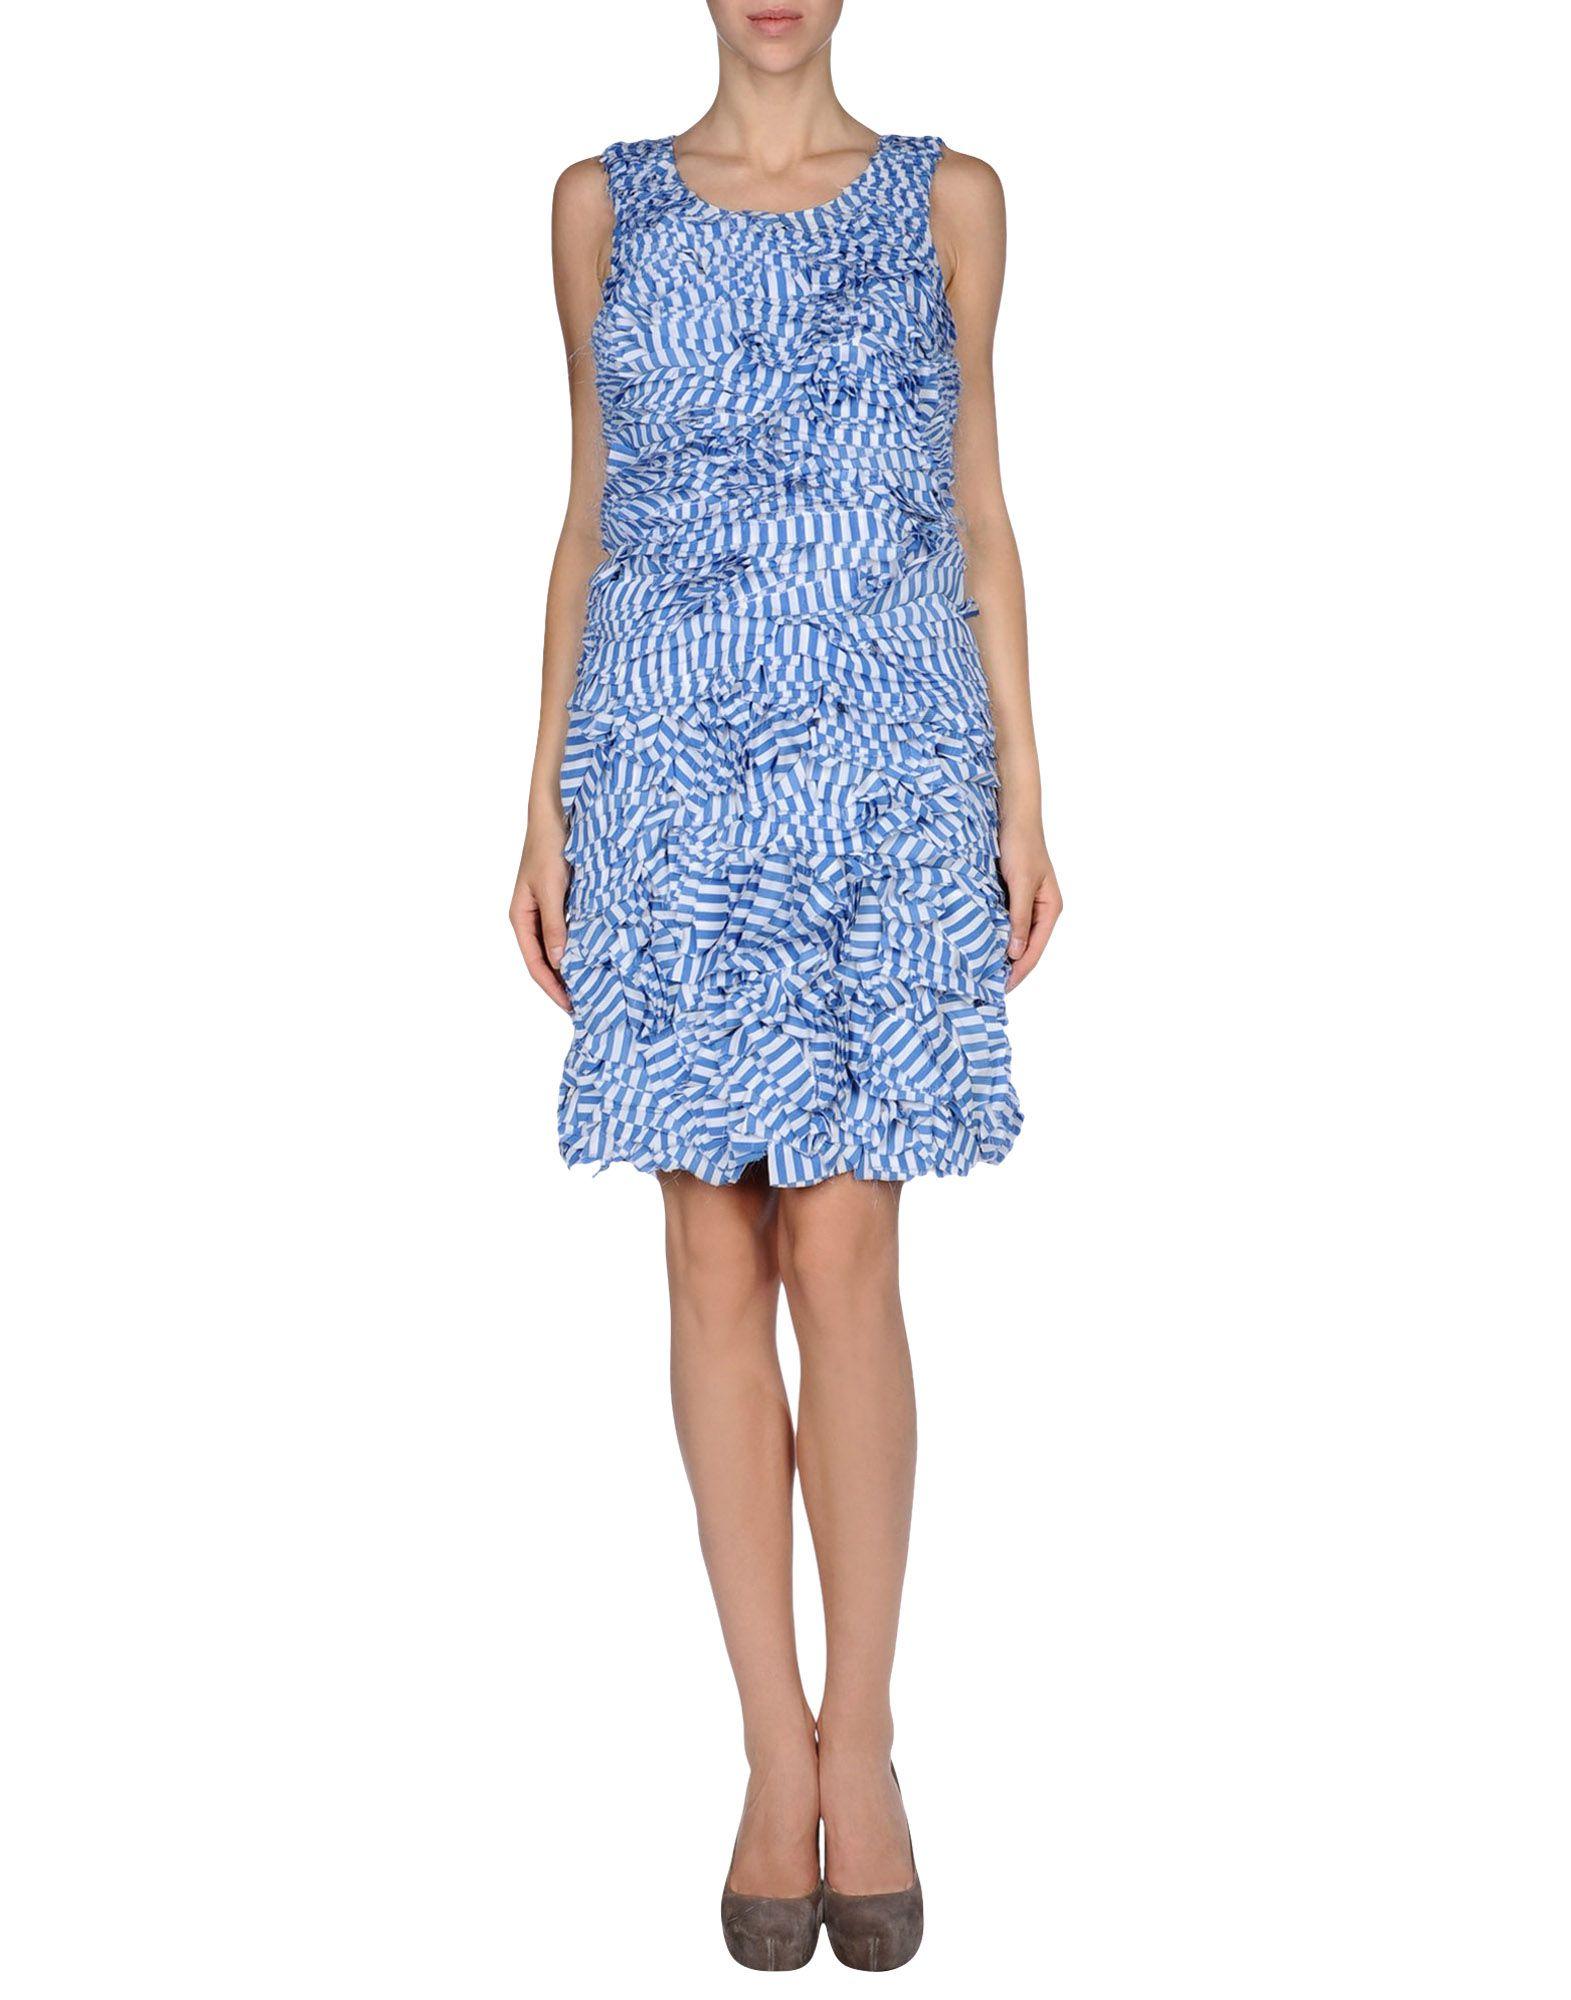 michael kors azure short dress product 3 14020515 917798974